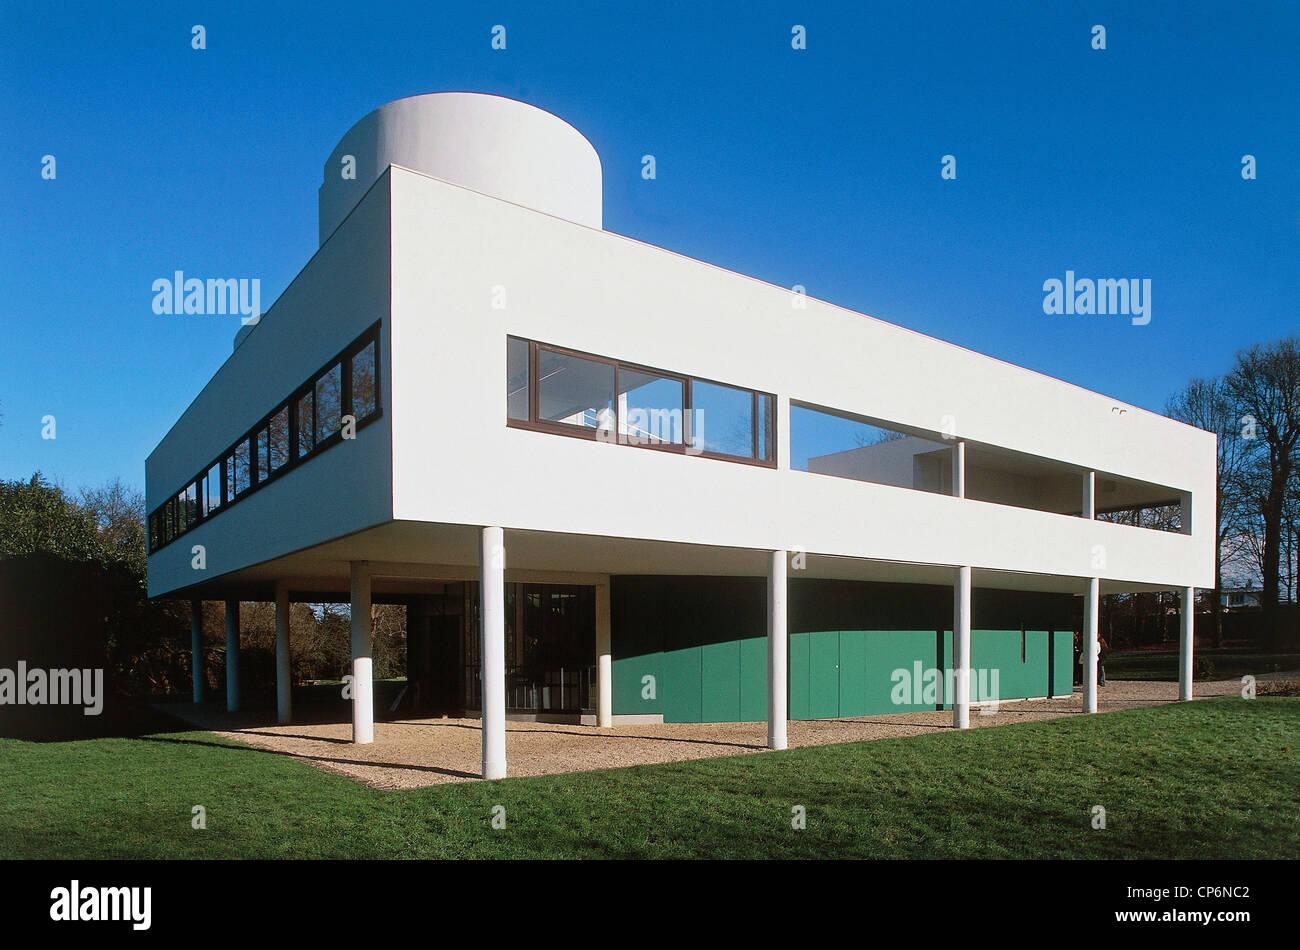 Villa Savoye Architect Le Corbusier Stock Photos & Villa Savoye ...